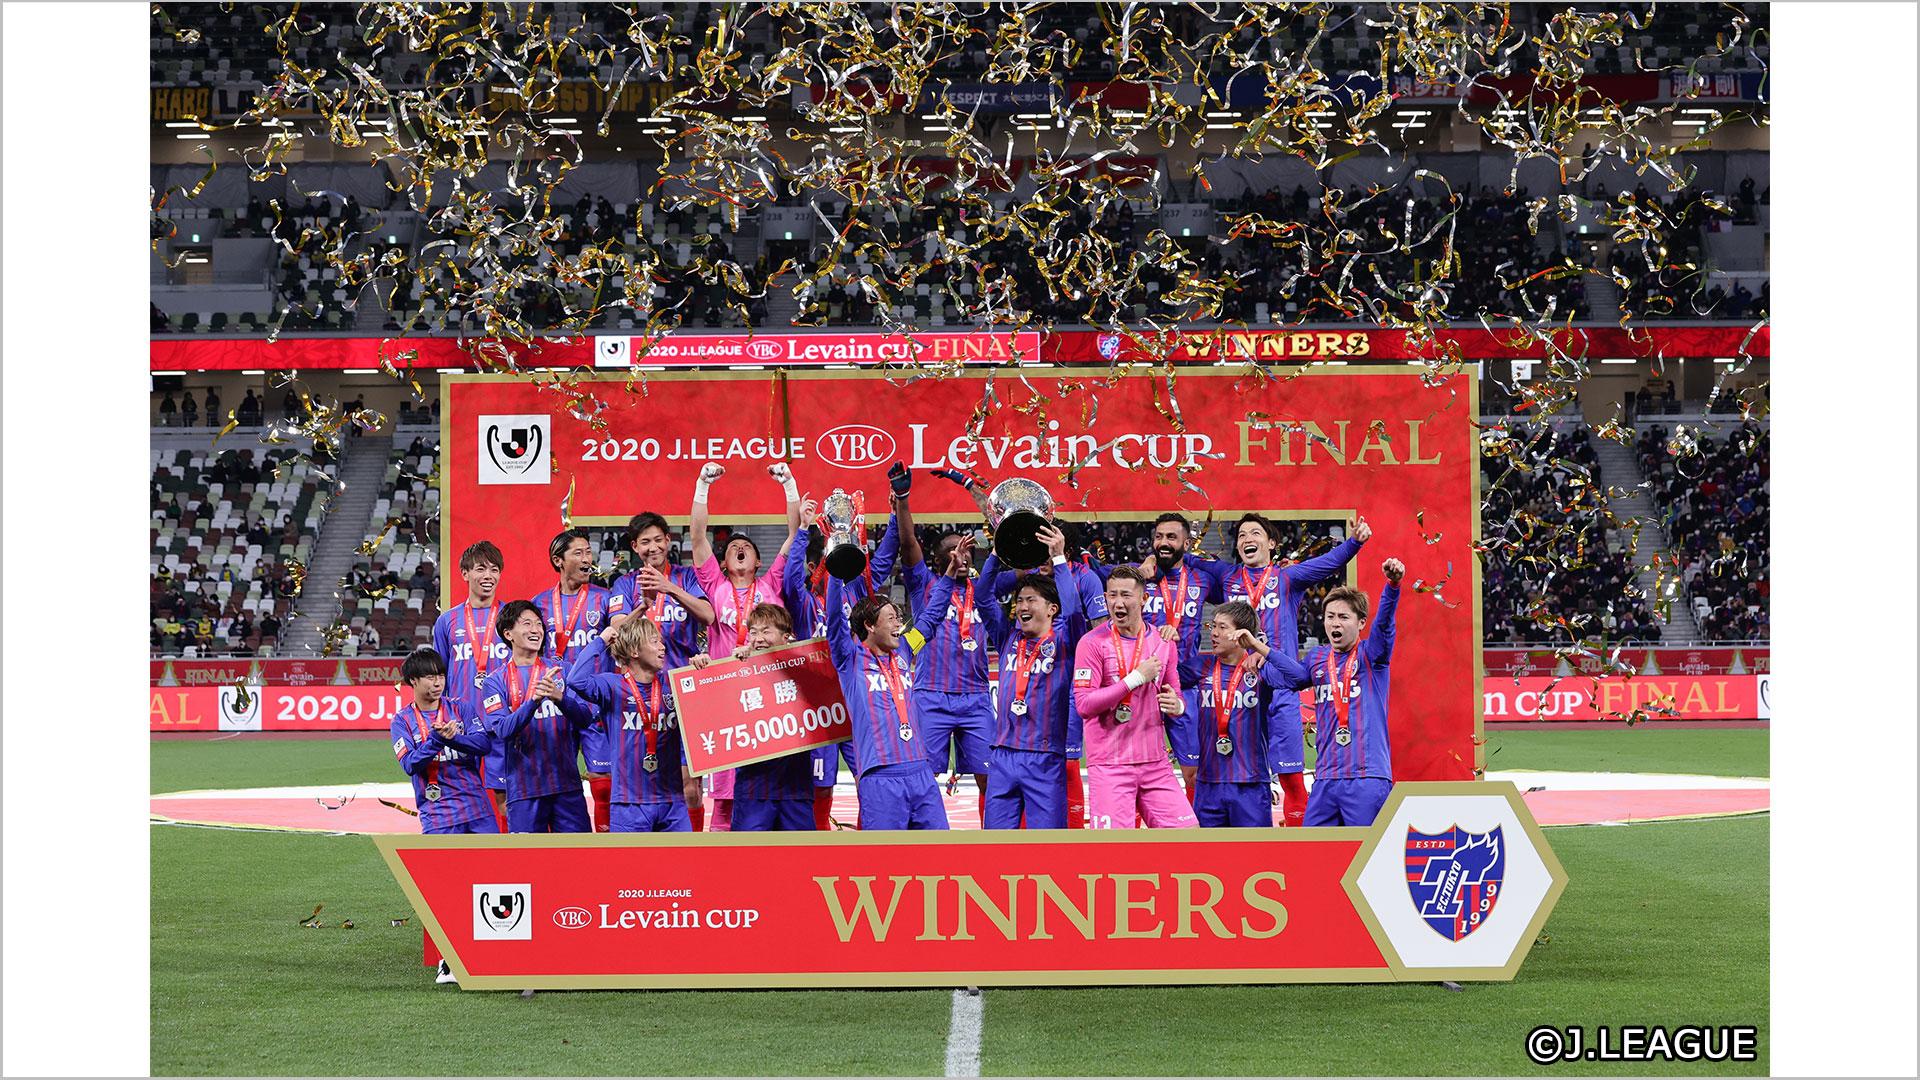 2021 JリーグYBCルヴァンカップ プライムステージ 準決勝 第2戦 FC東京 vs 名古屋グランパス